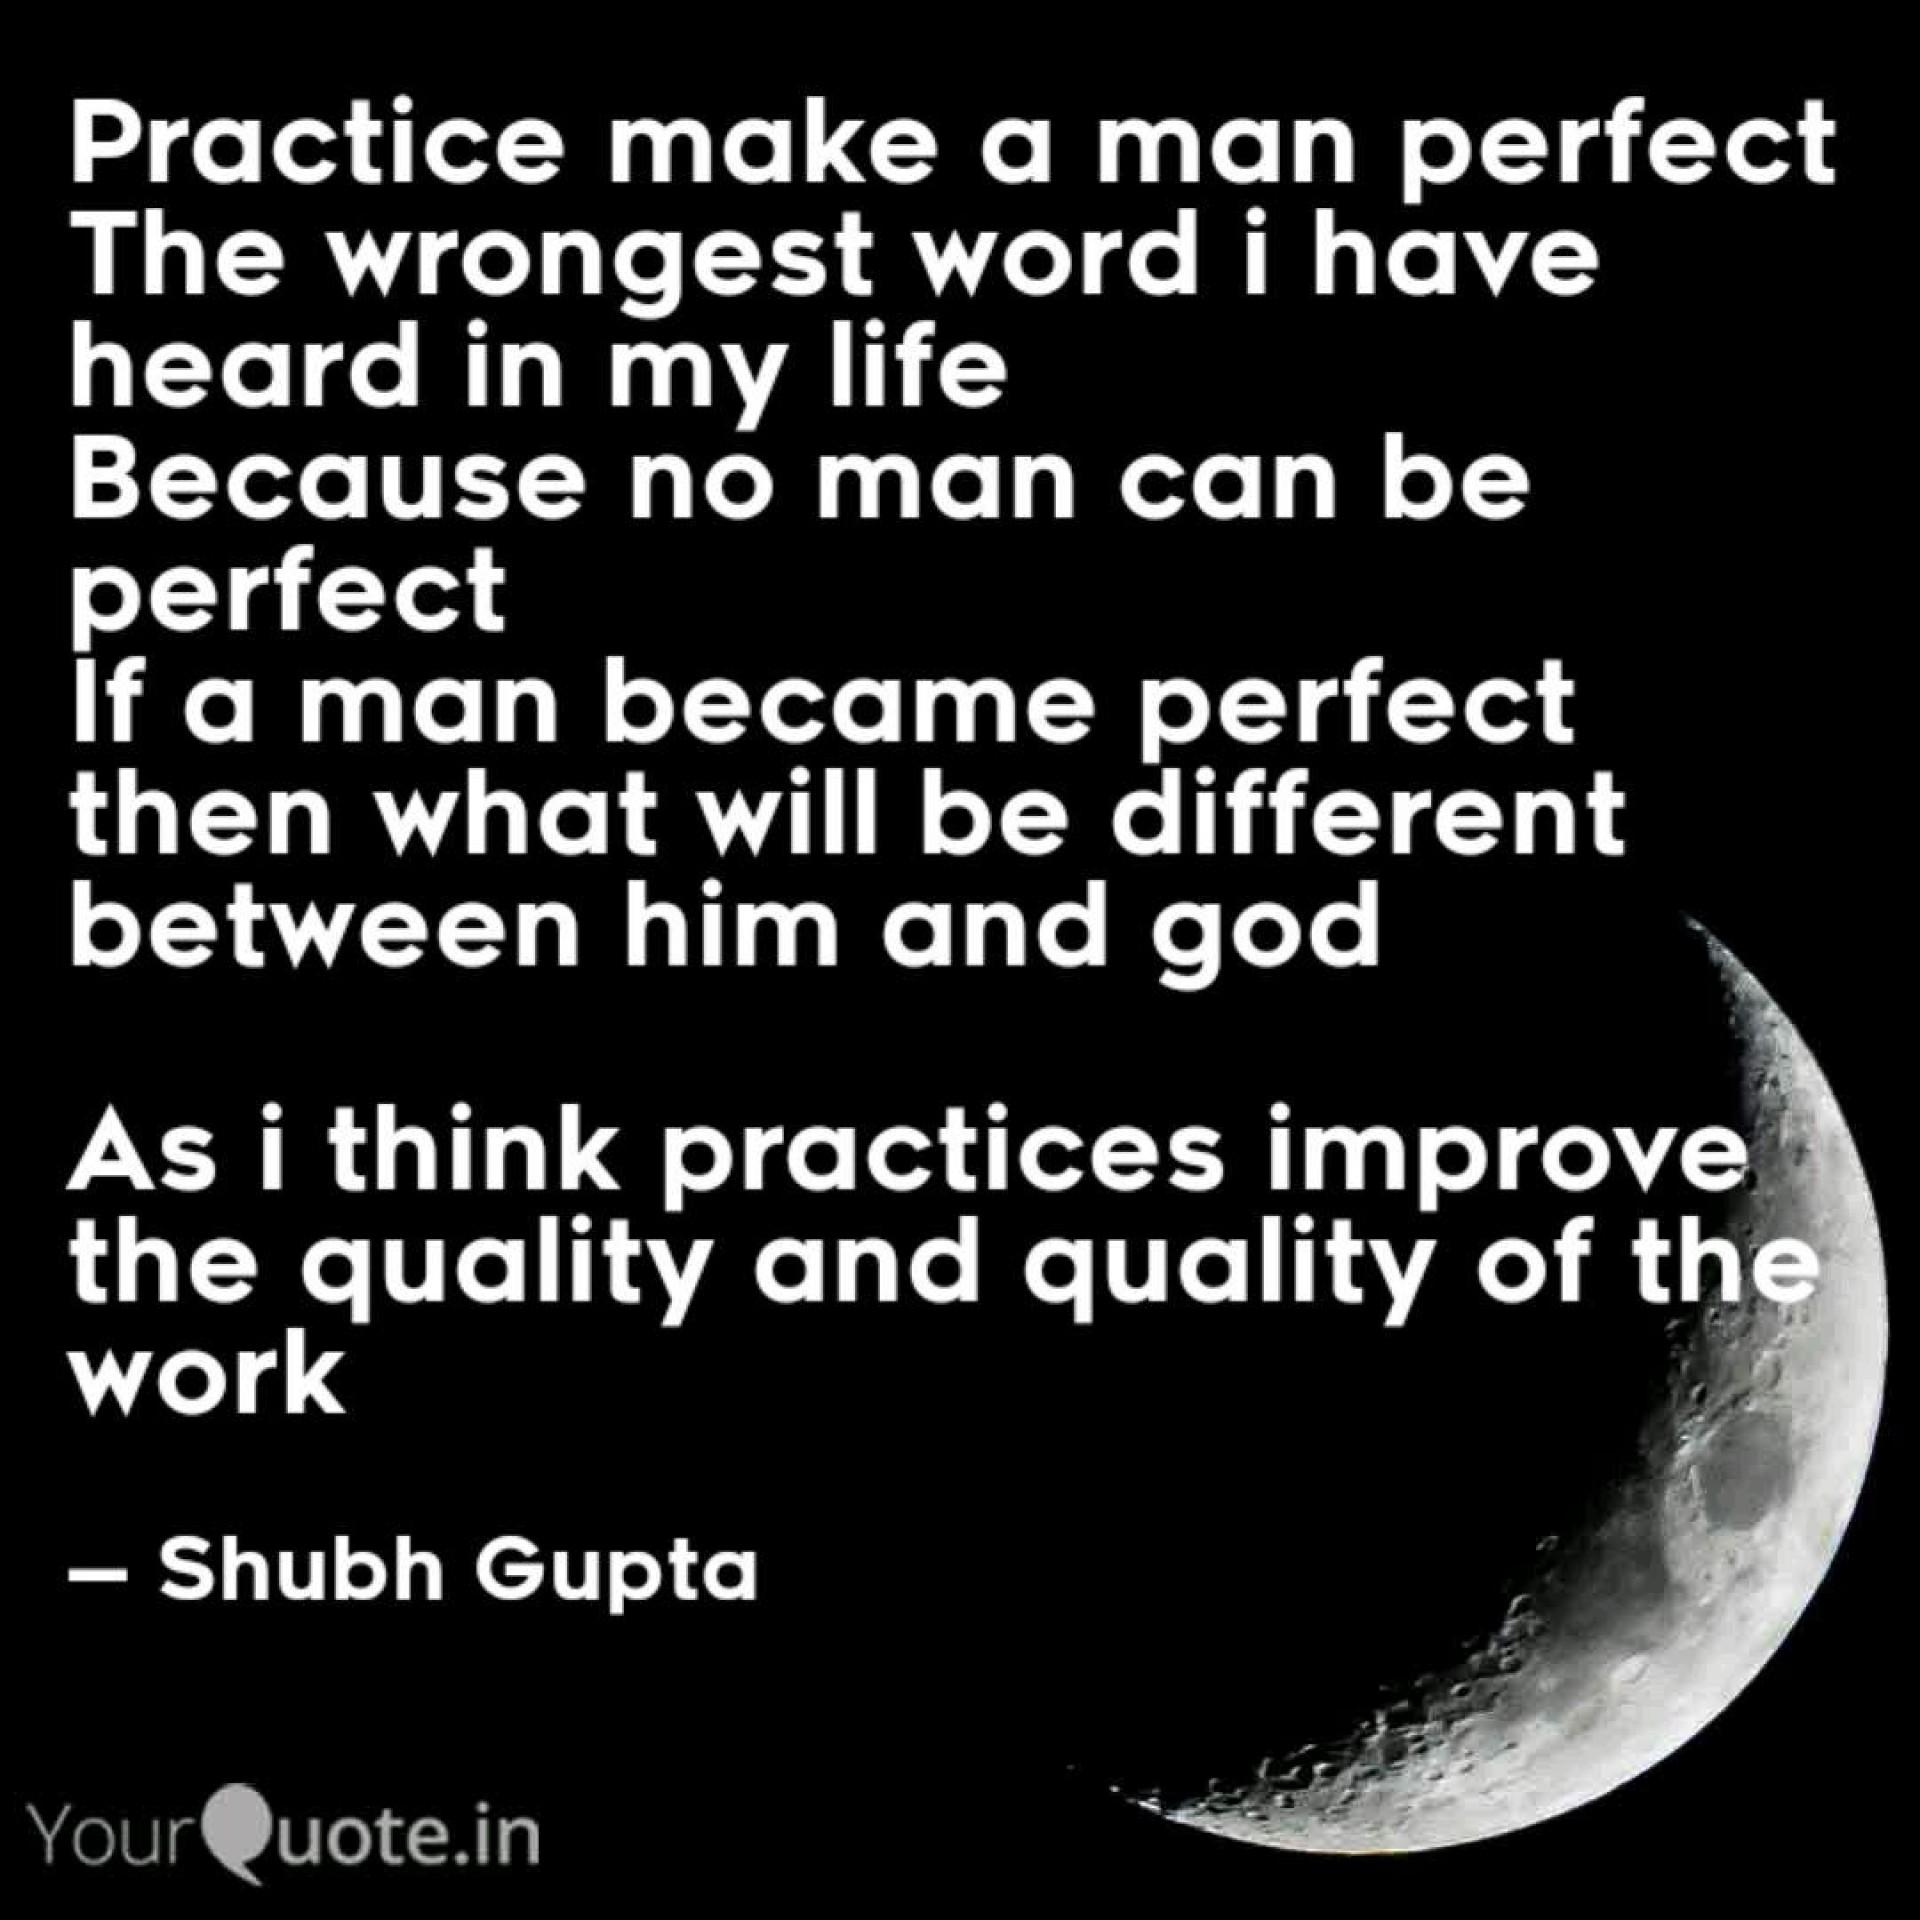 024 Essay Example Practice Makes Man Perfect Singular In Hindi 1920